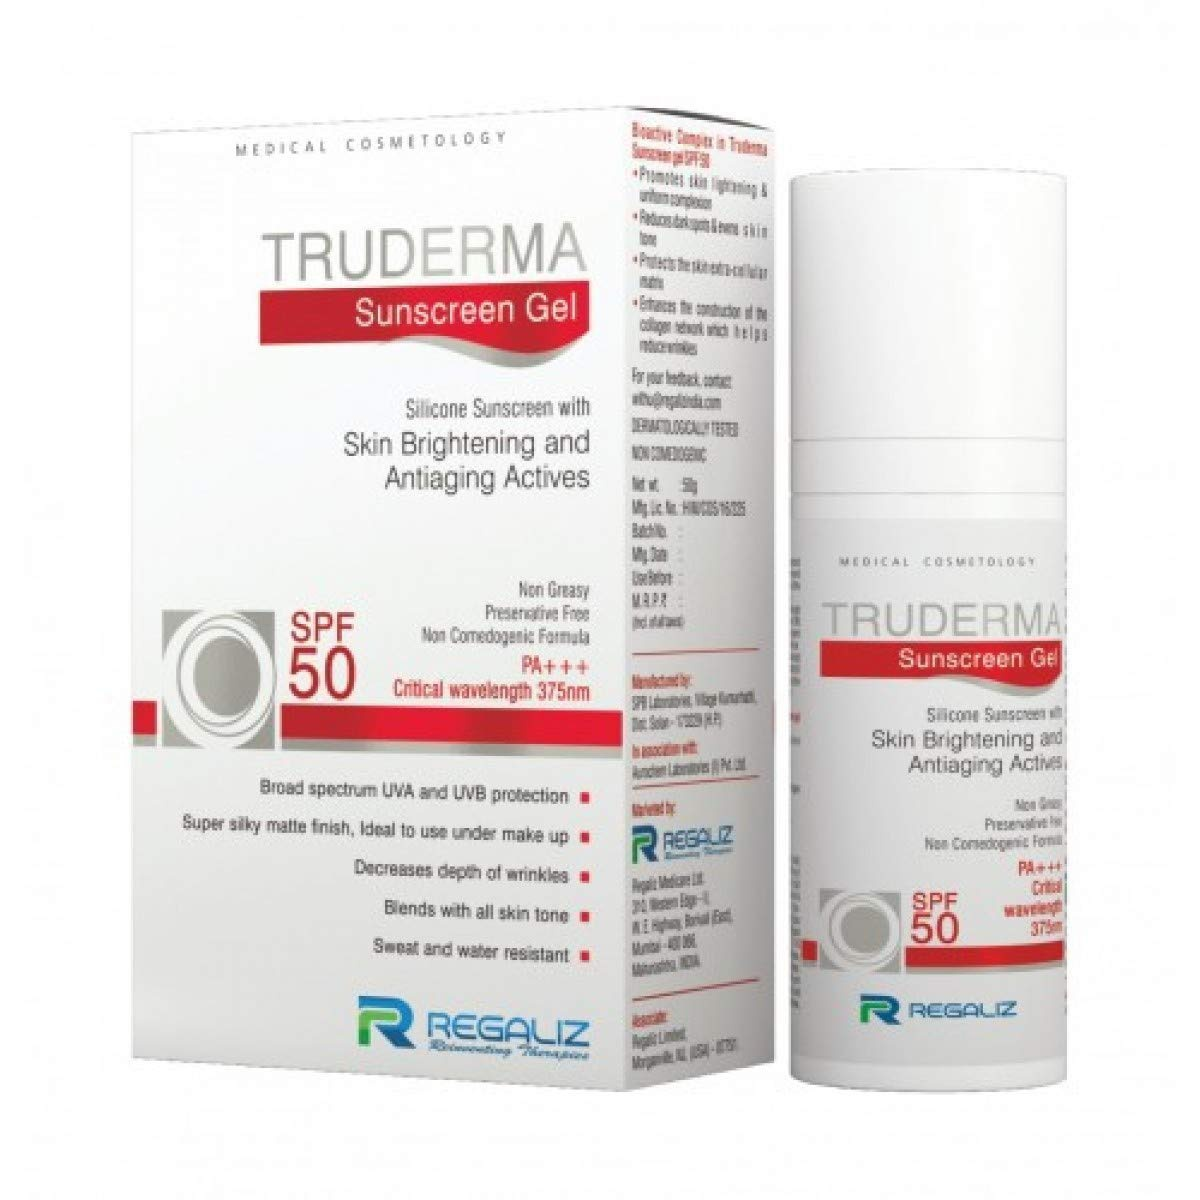 Regaliz Truderma Spf-50 Sunscreen Gel